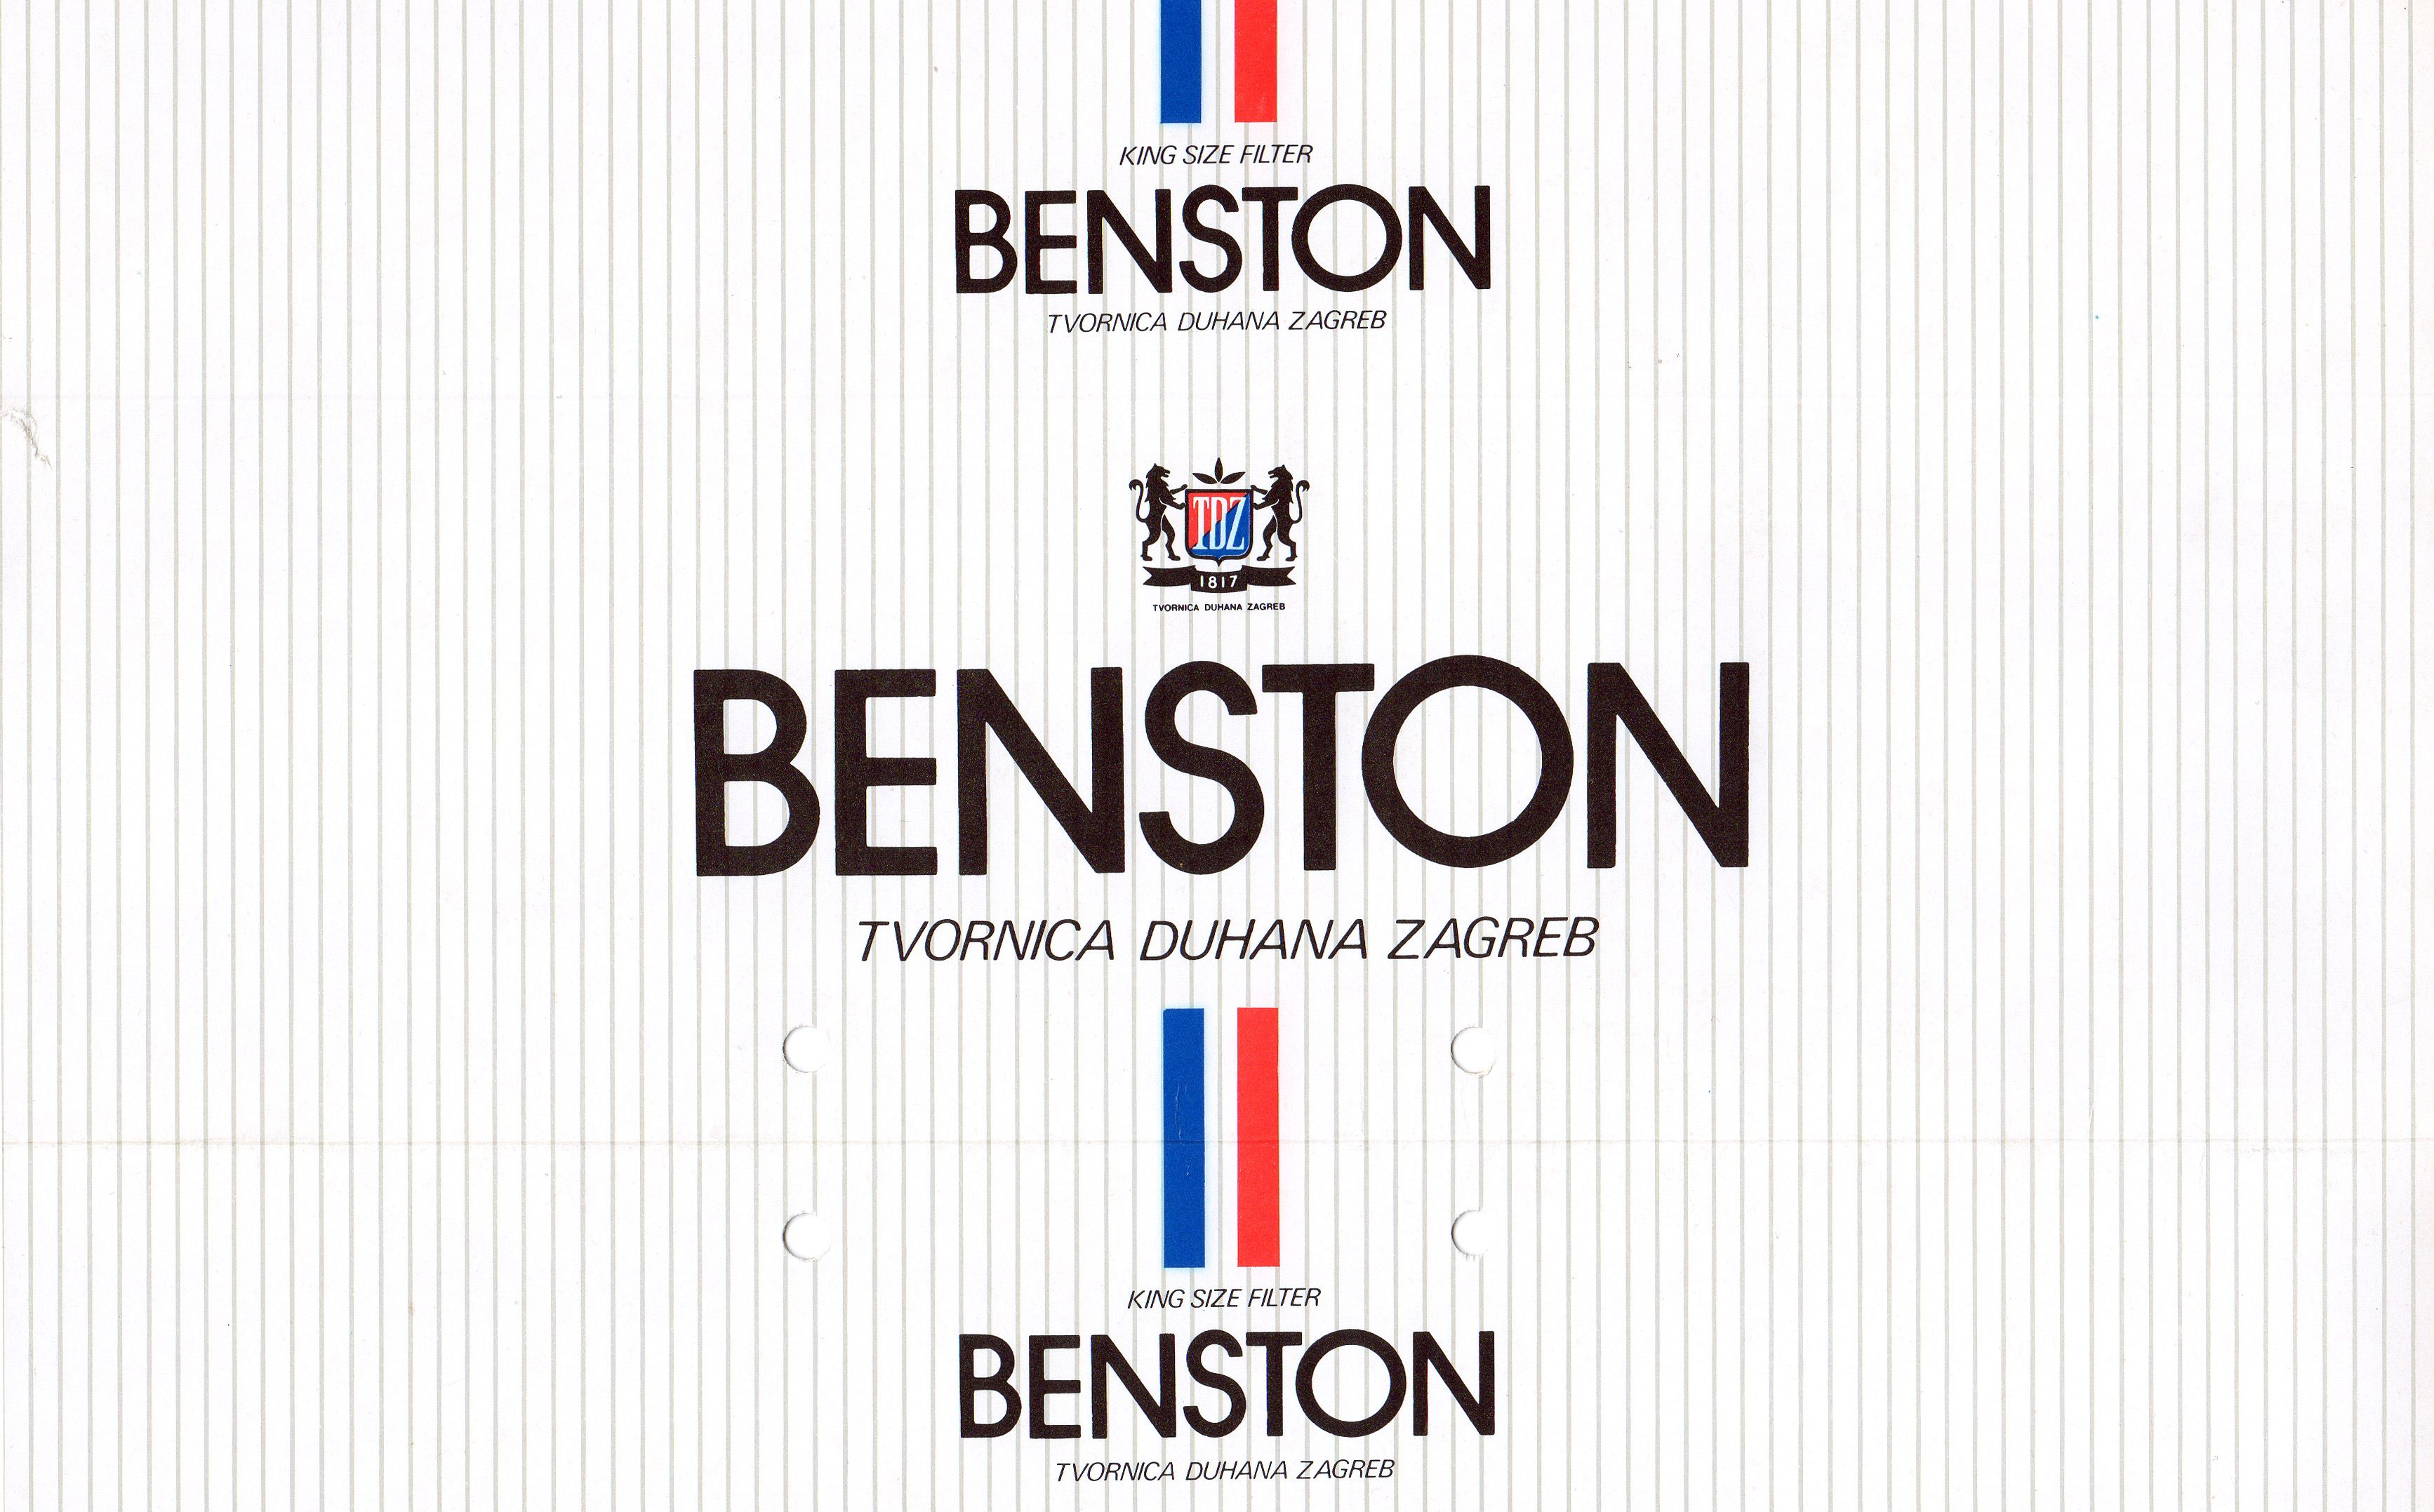 Original Outer Box For Benston Cigarettes Advertising Material Tech Company Logos